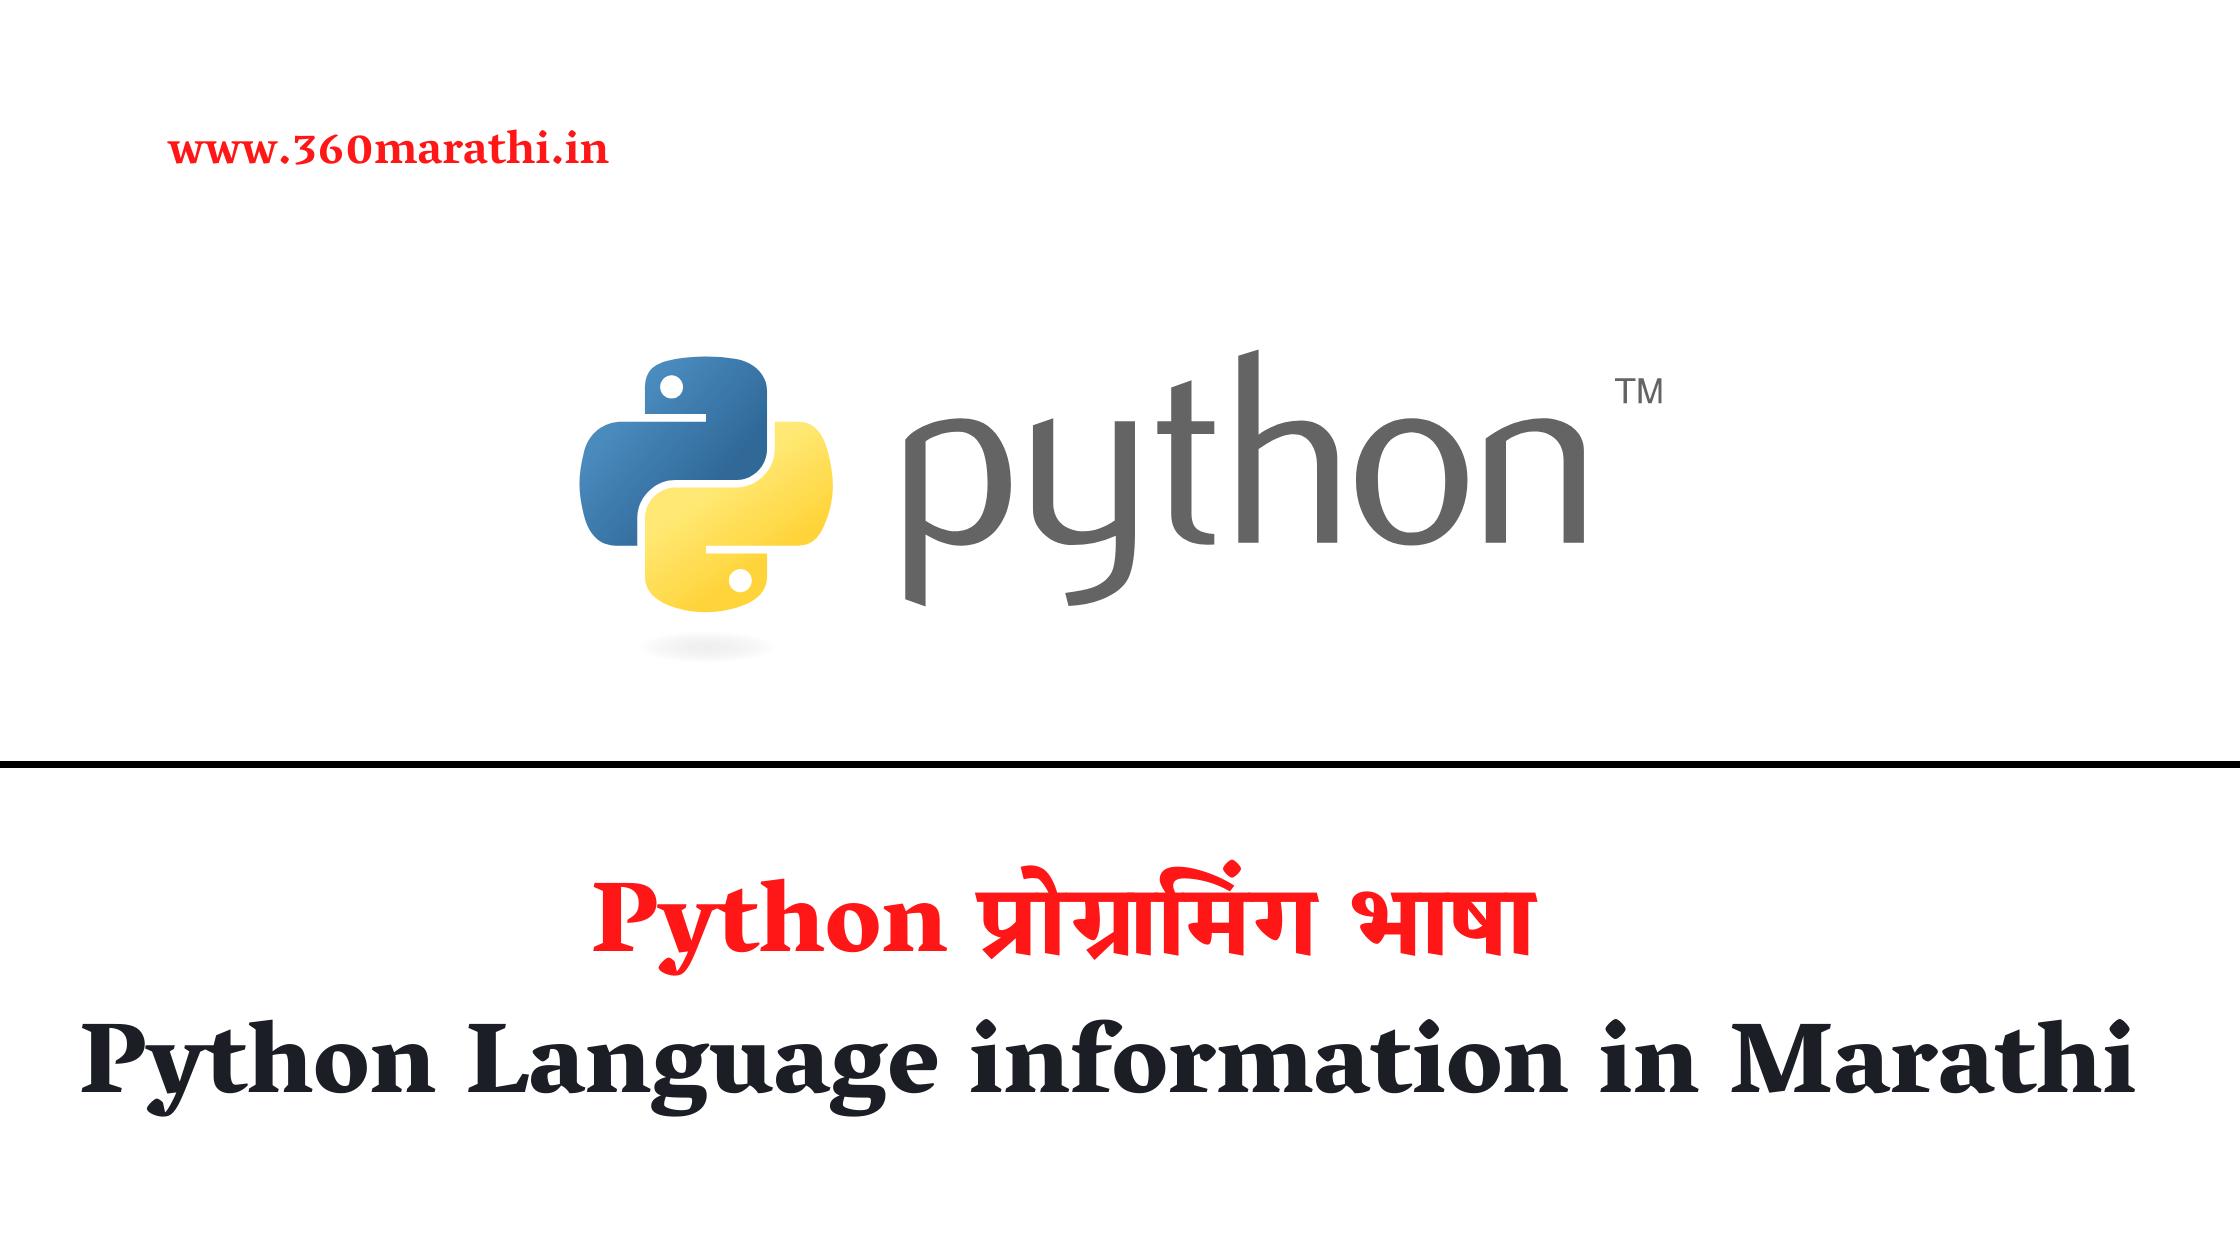 Python प्रोग्रामिंग भाषा म्हणजे काय | Python Language information in Marathi